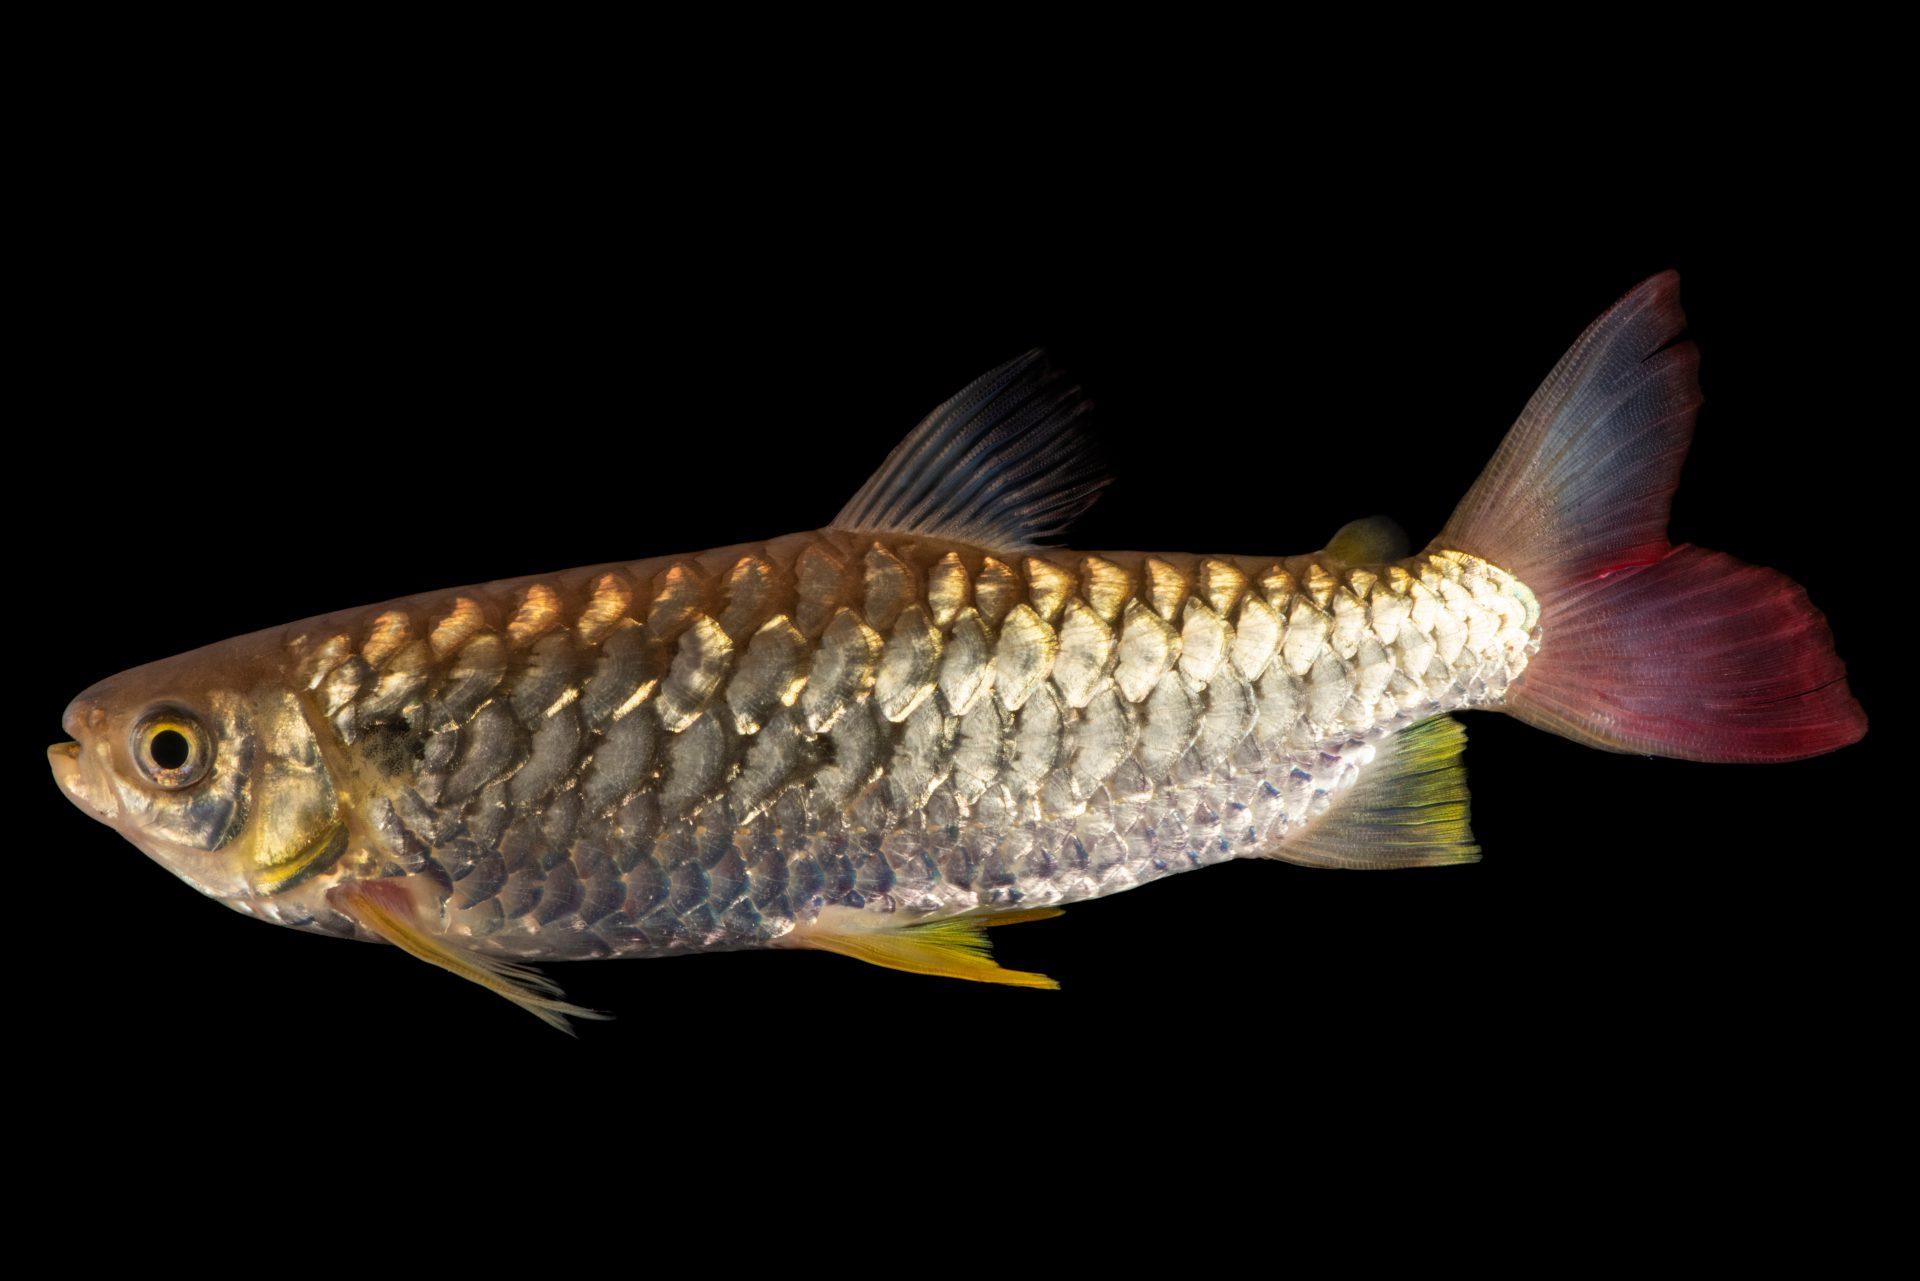 Photo: A male yellowfin chalceus (Chalceus erythrurus) at the Dallas World Aquarium.